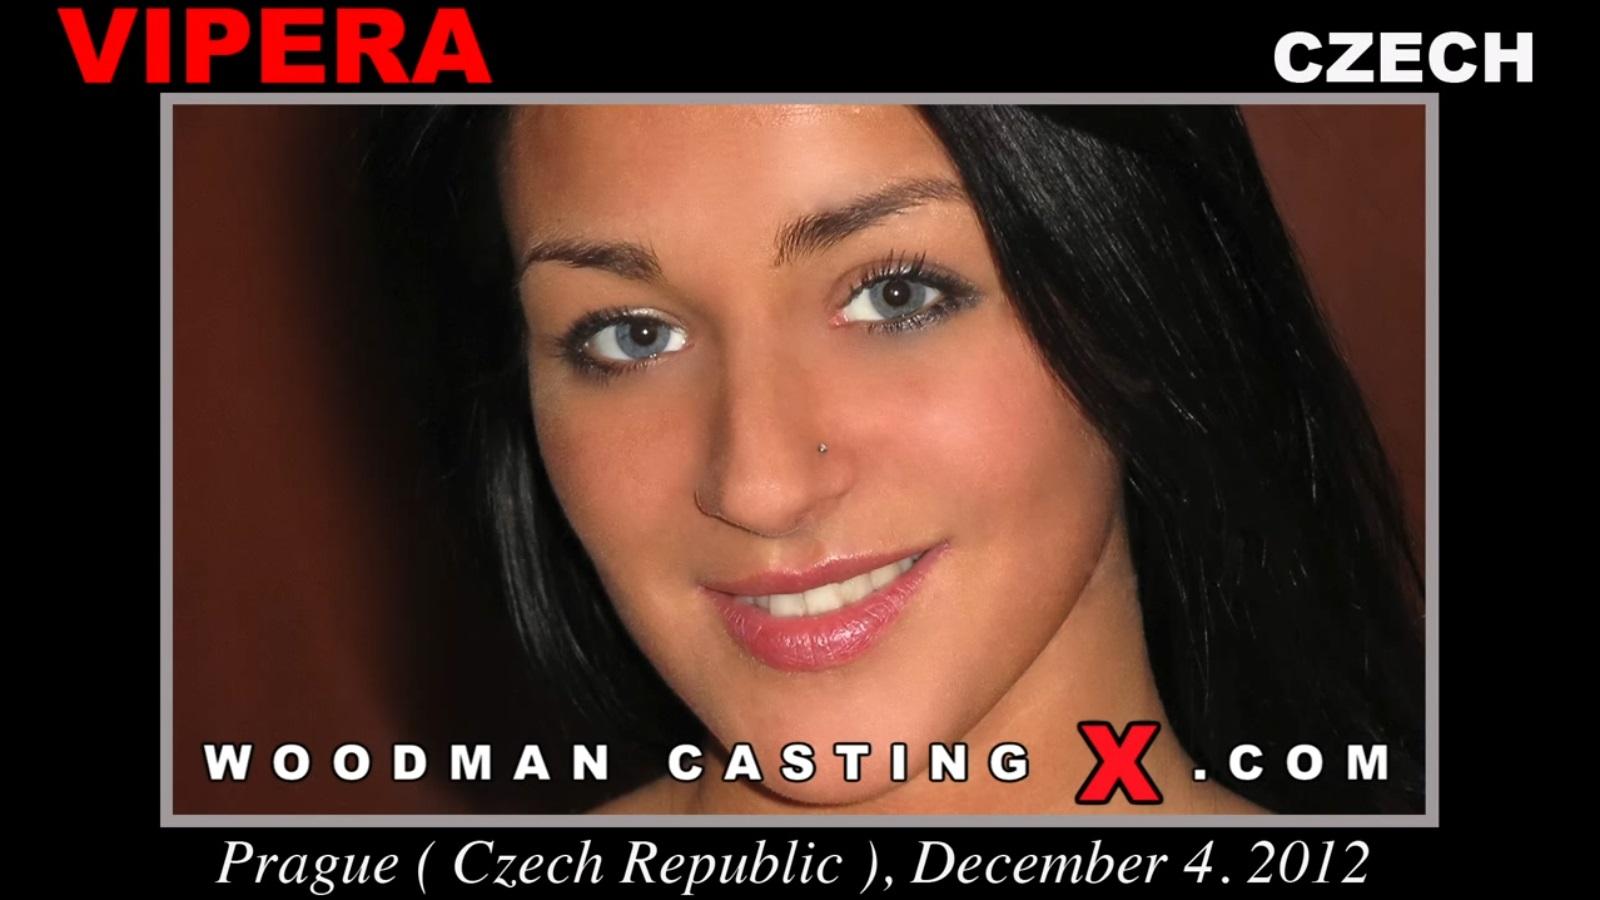 Casting x woodman torrent 12 фотография